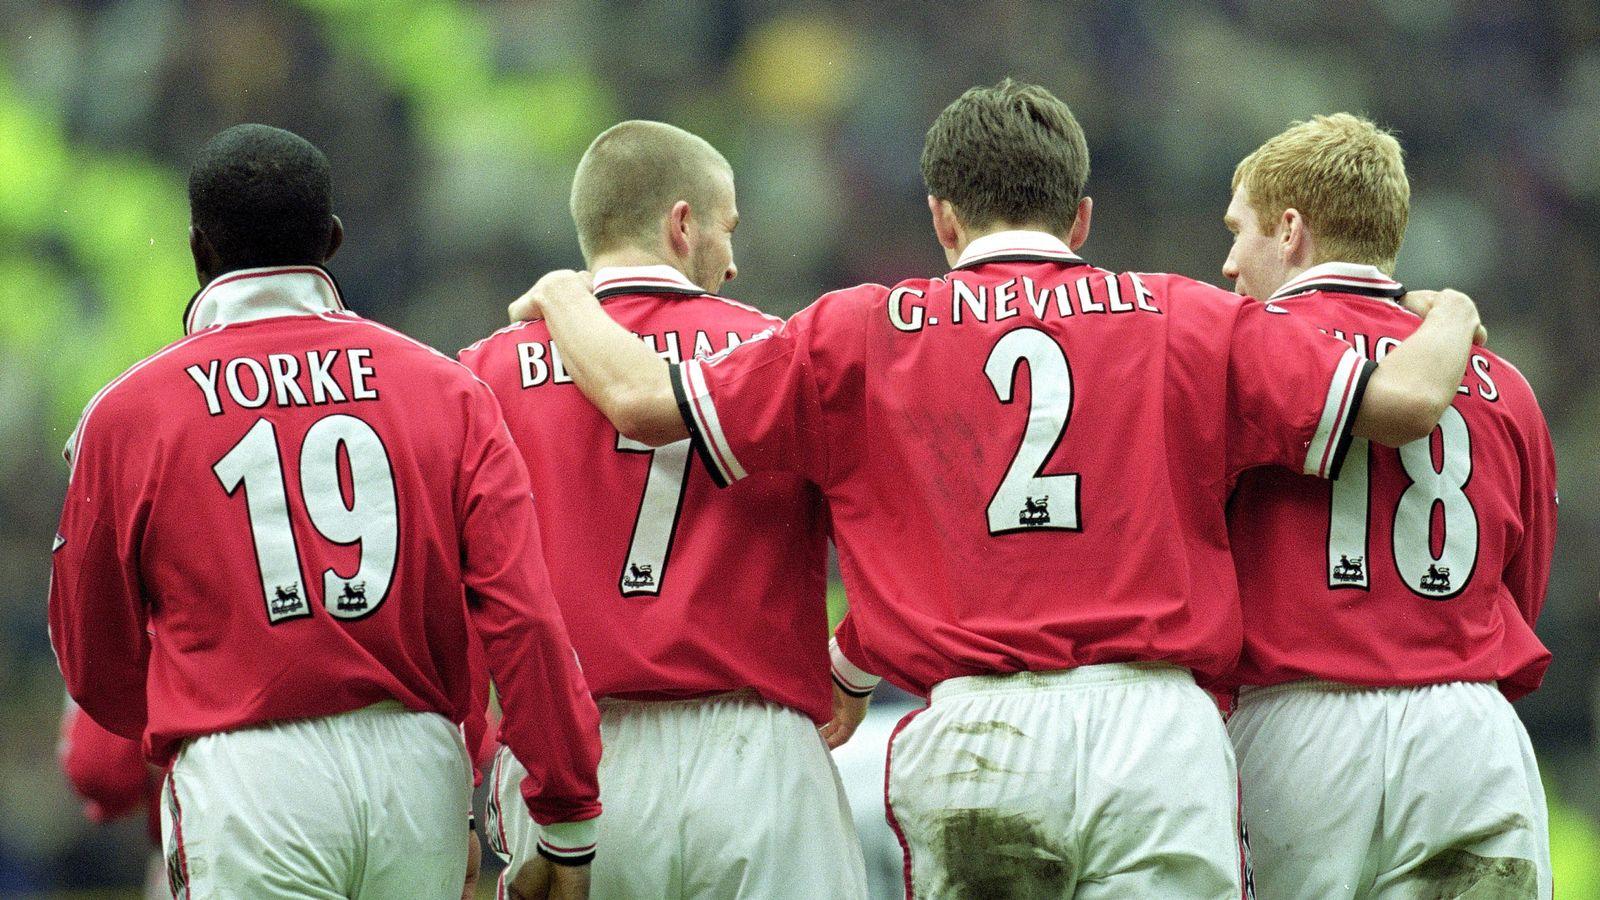 Дэвид Бэкхем, Пол Скоулз и Гарри Невилл в Манчестер Юнайтед